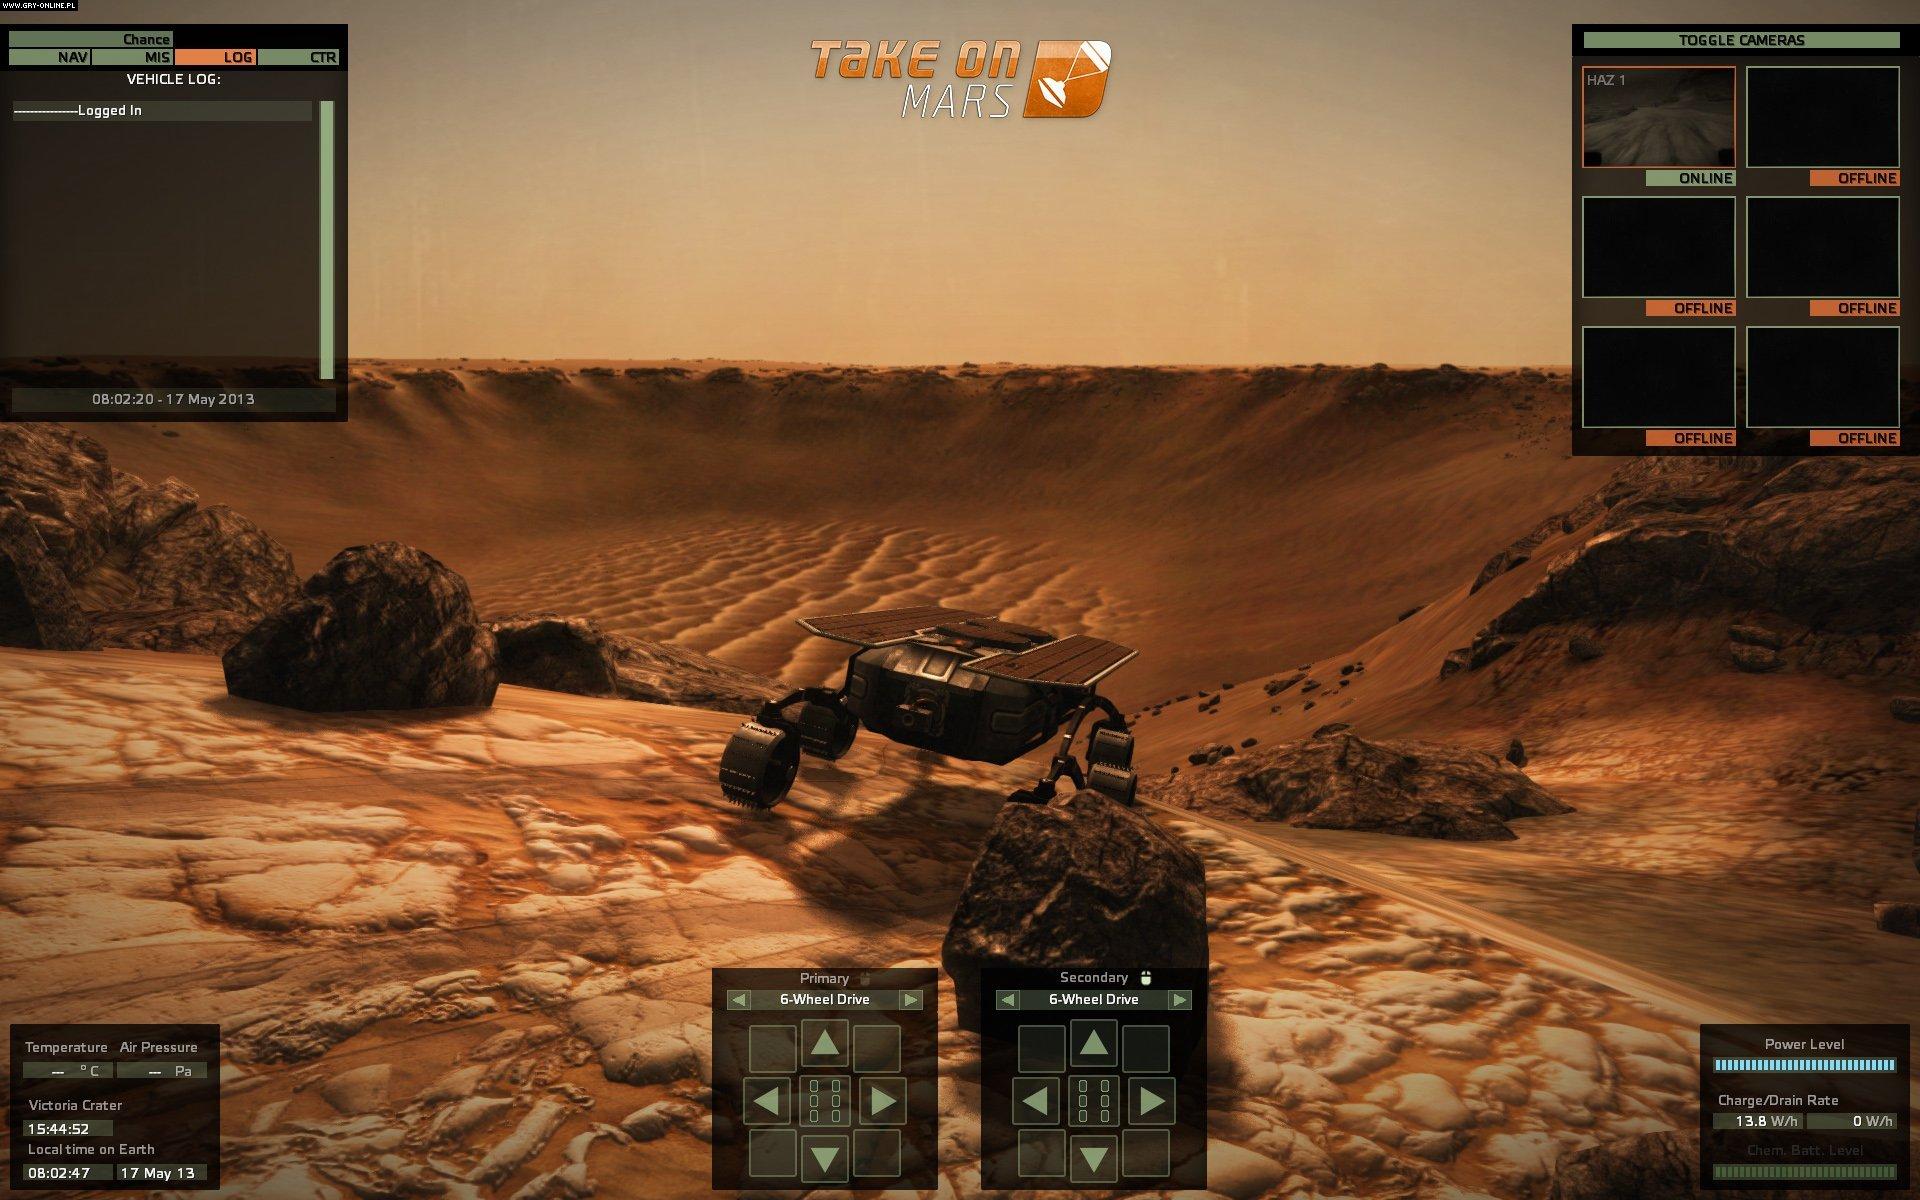 Take on Mars PC Games Image 48/48, Bohemia Interactive Studio